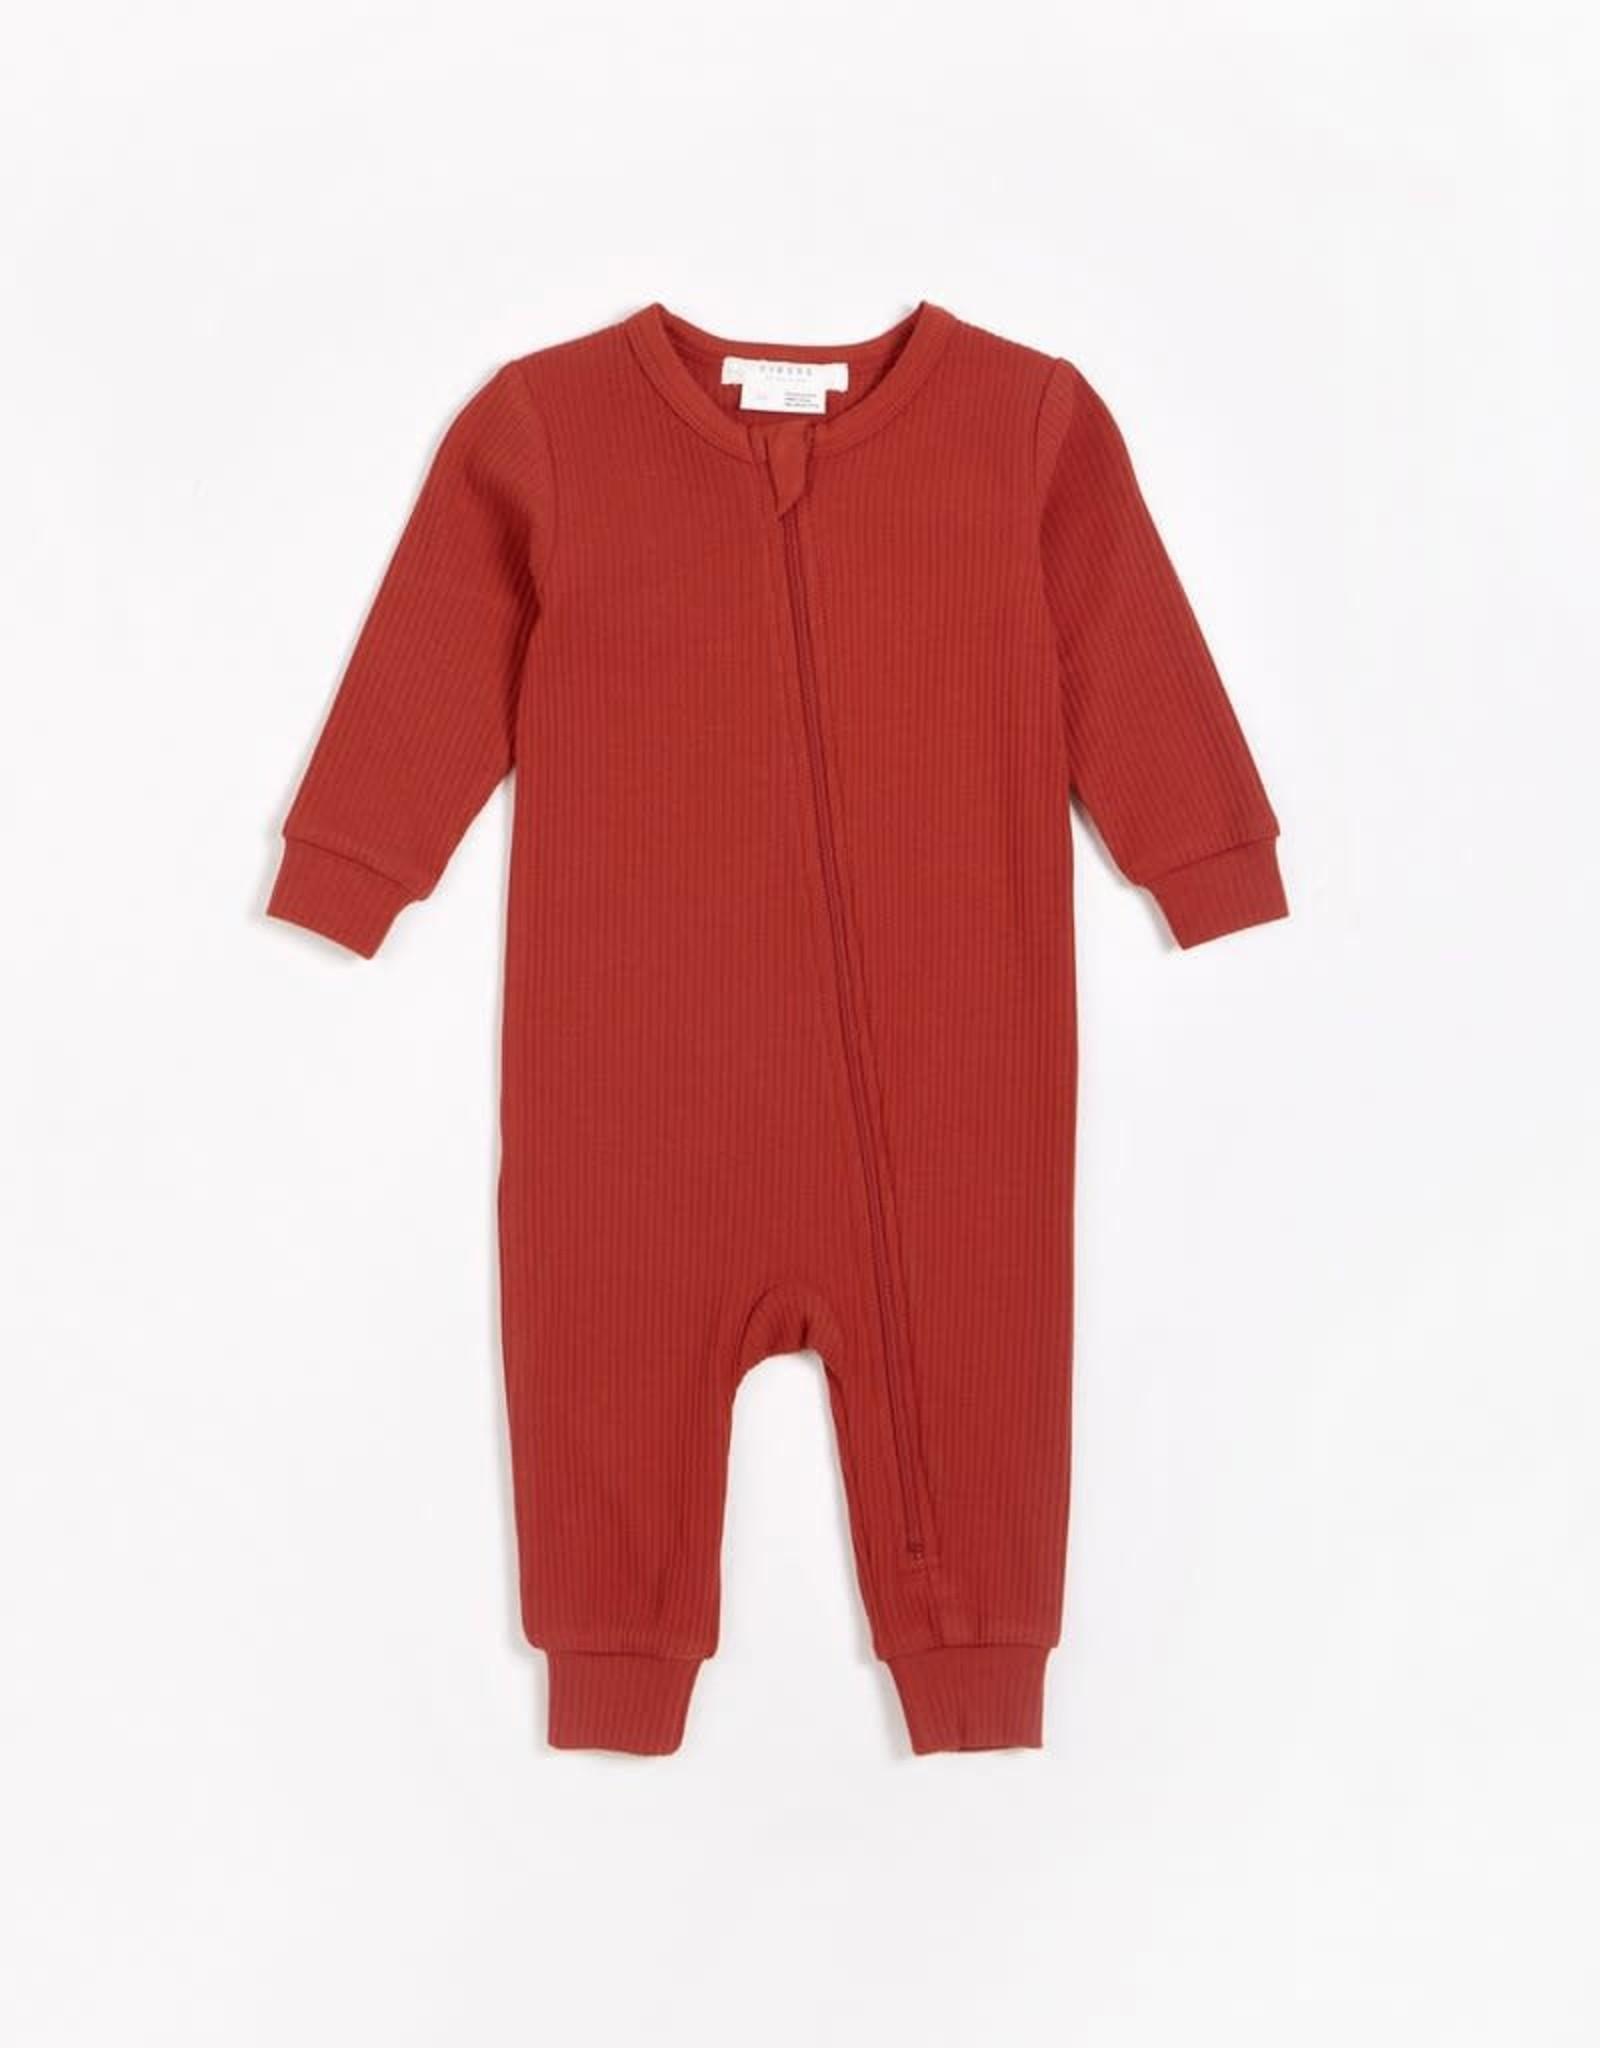 Petit Lem Petit Lem Firsts Baby Modal Rib Playsuit